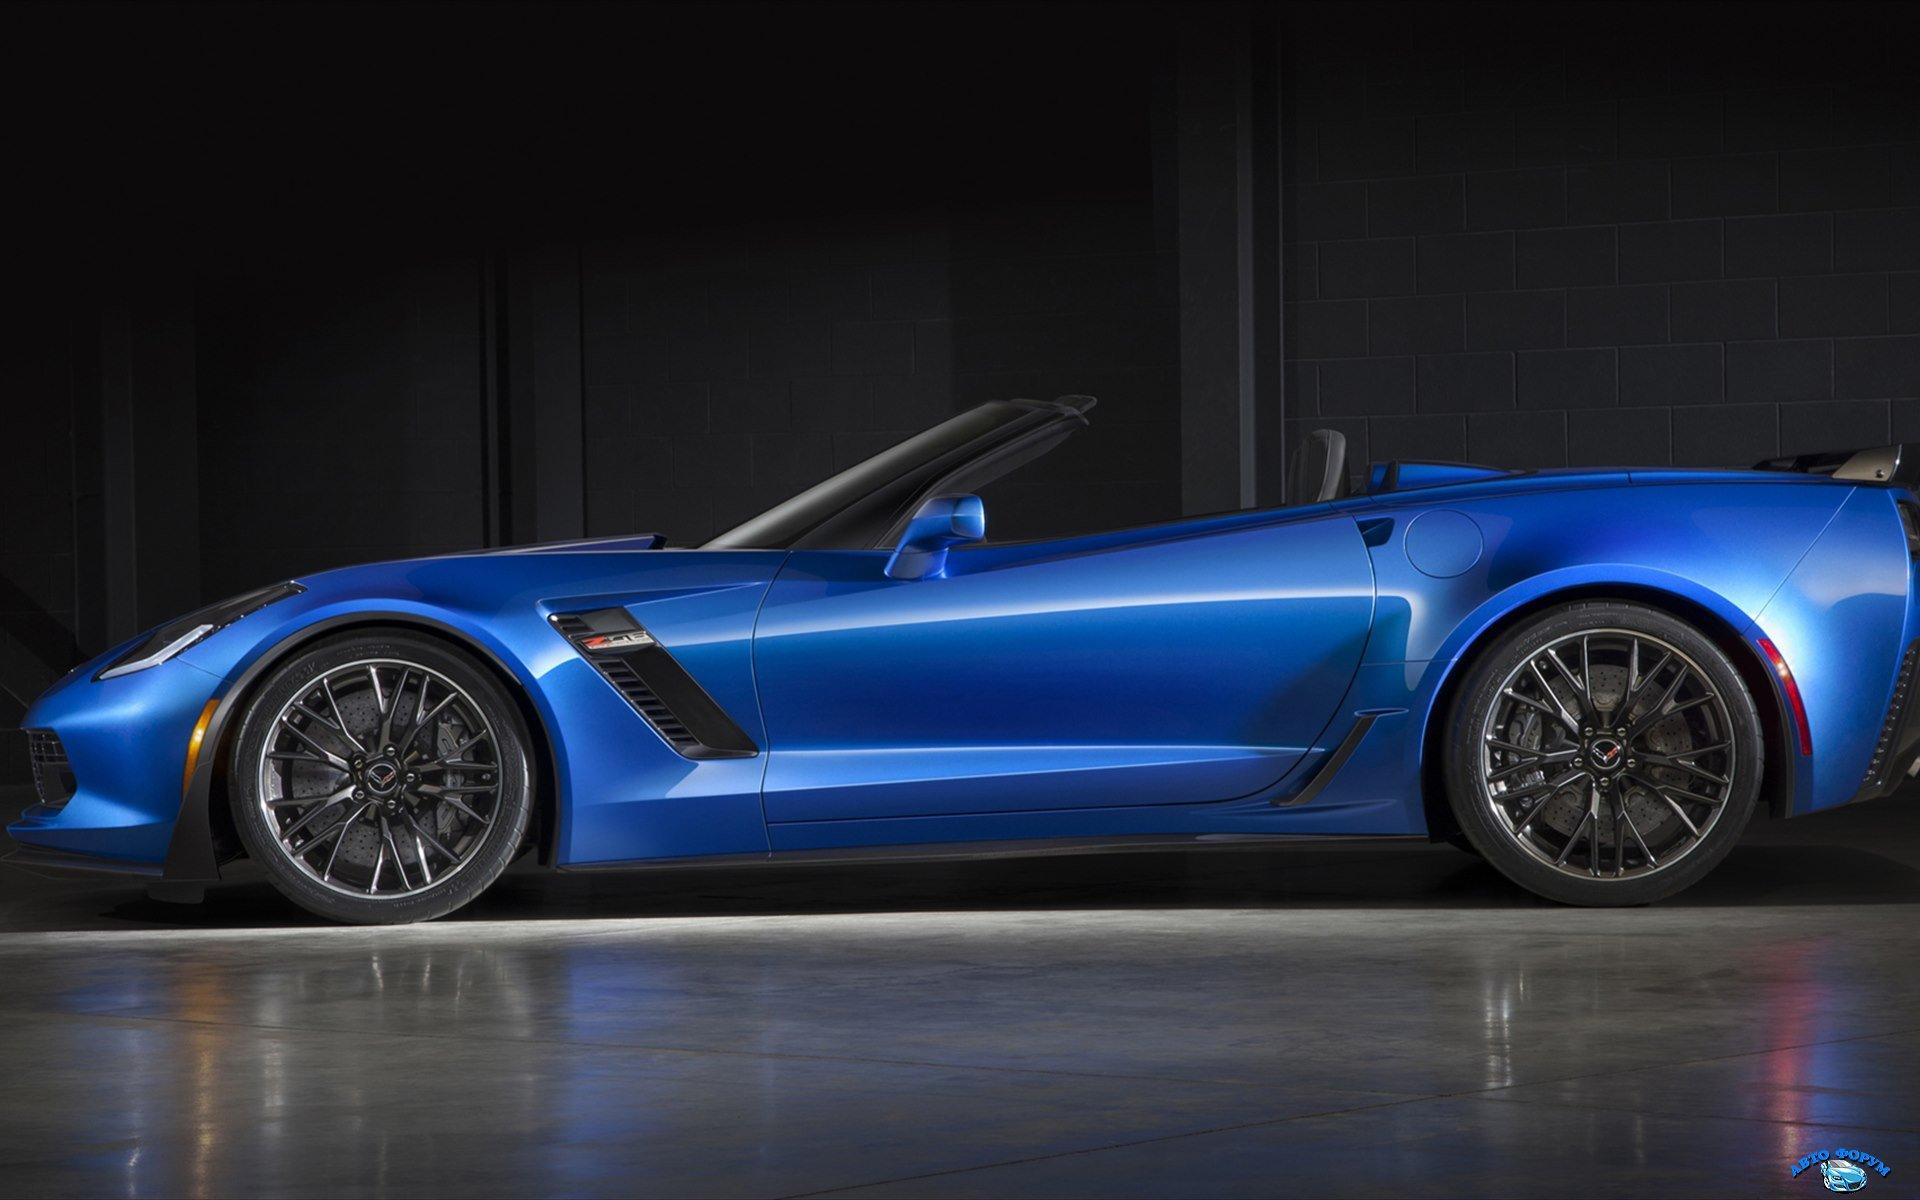 Chevrolet-Corvette-Z06-Convertible-2015-widescreen-09.jpg